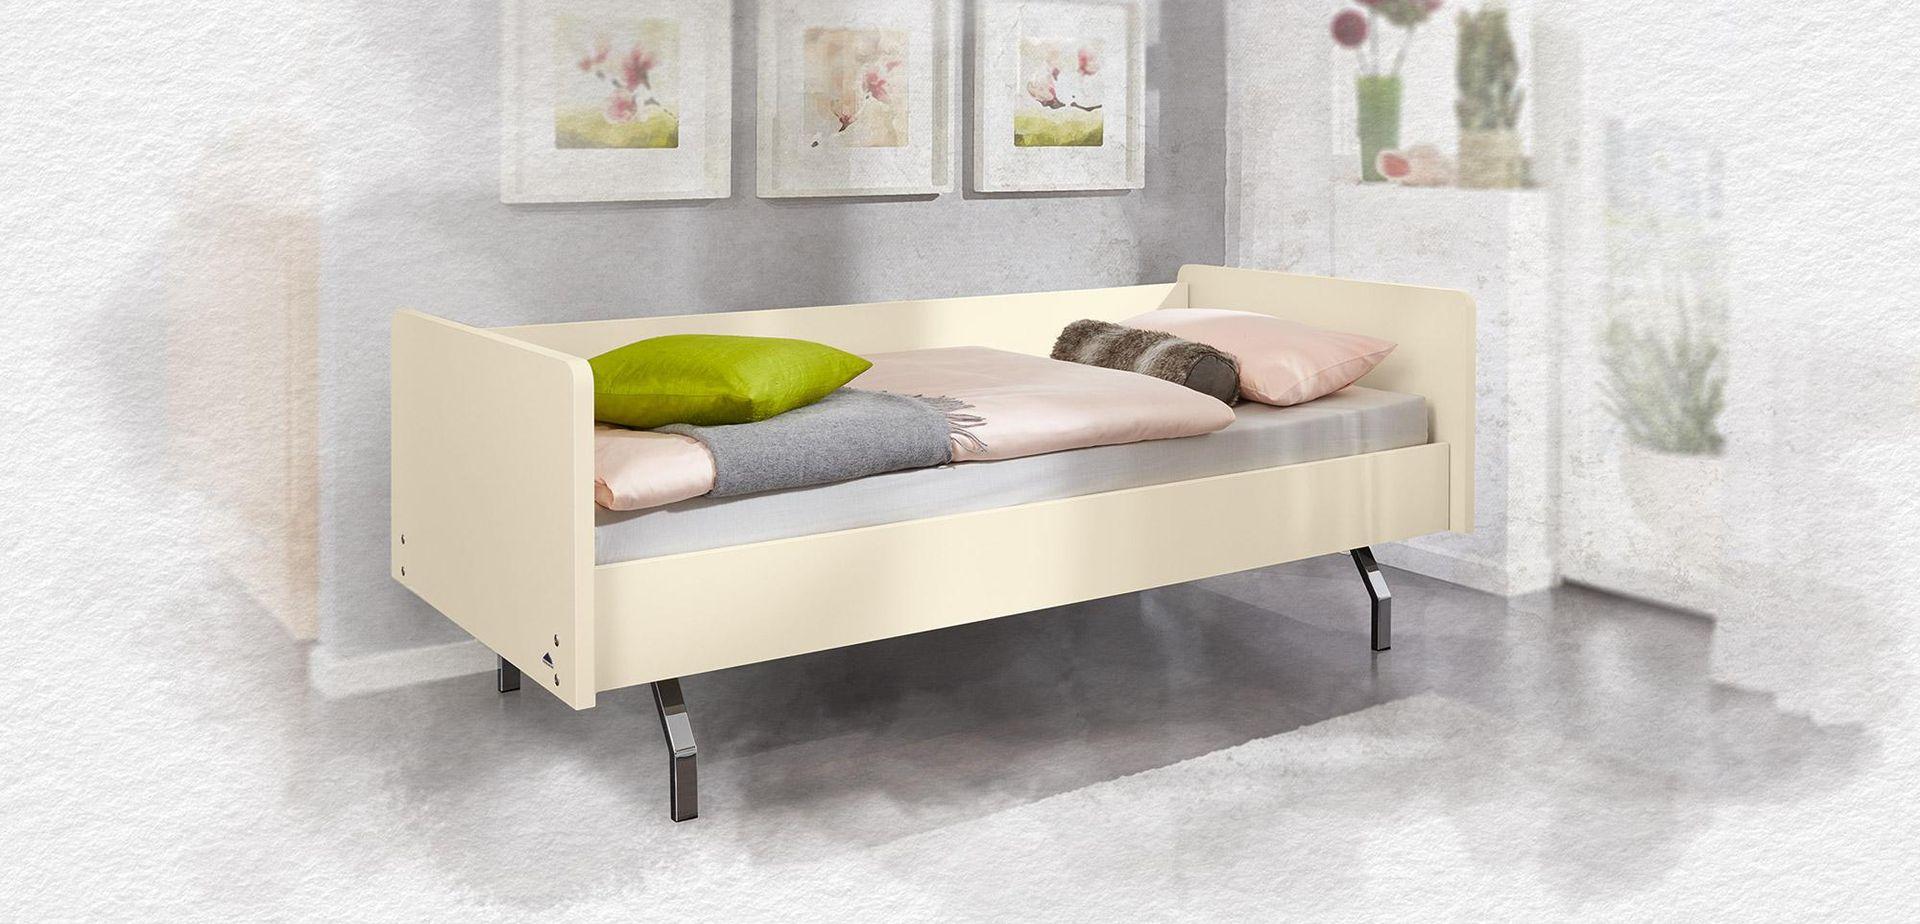 care beds stiegelmeyer